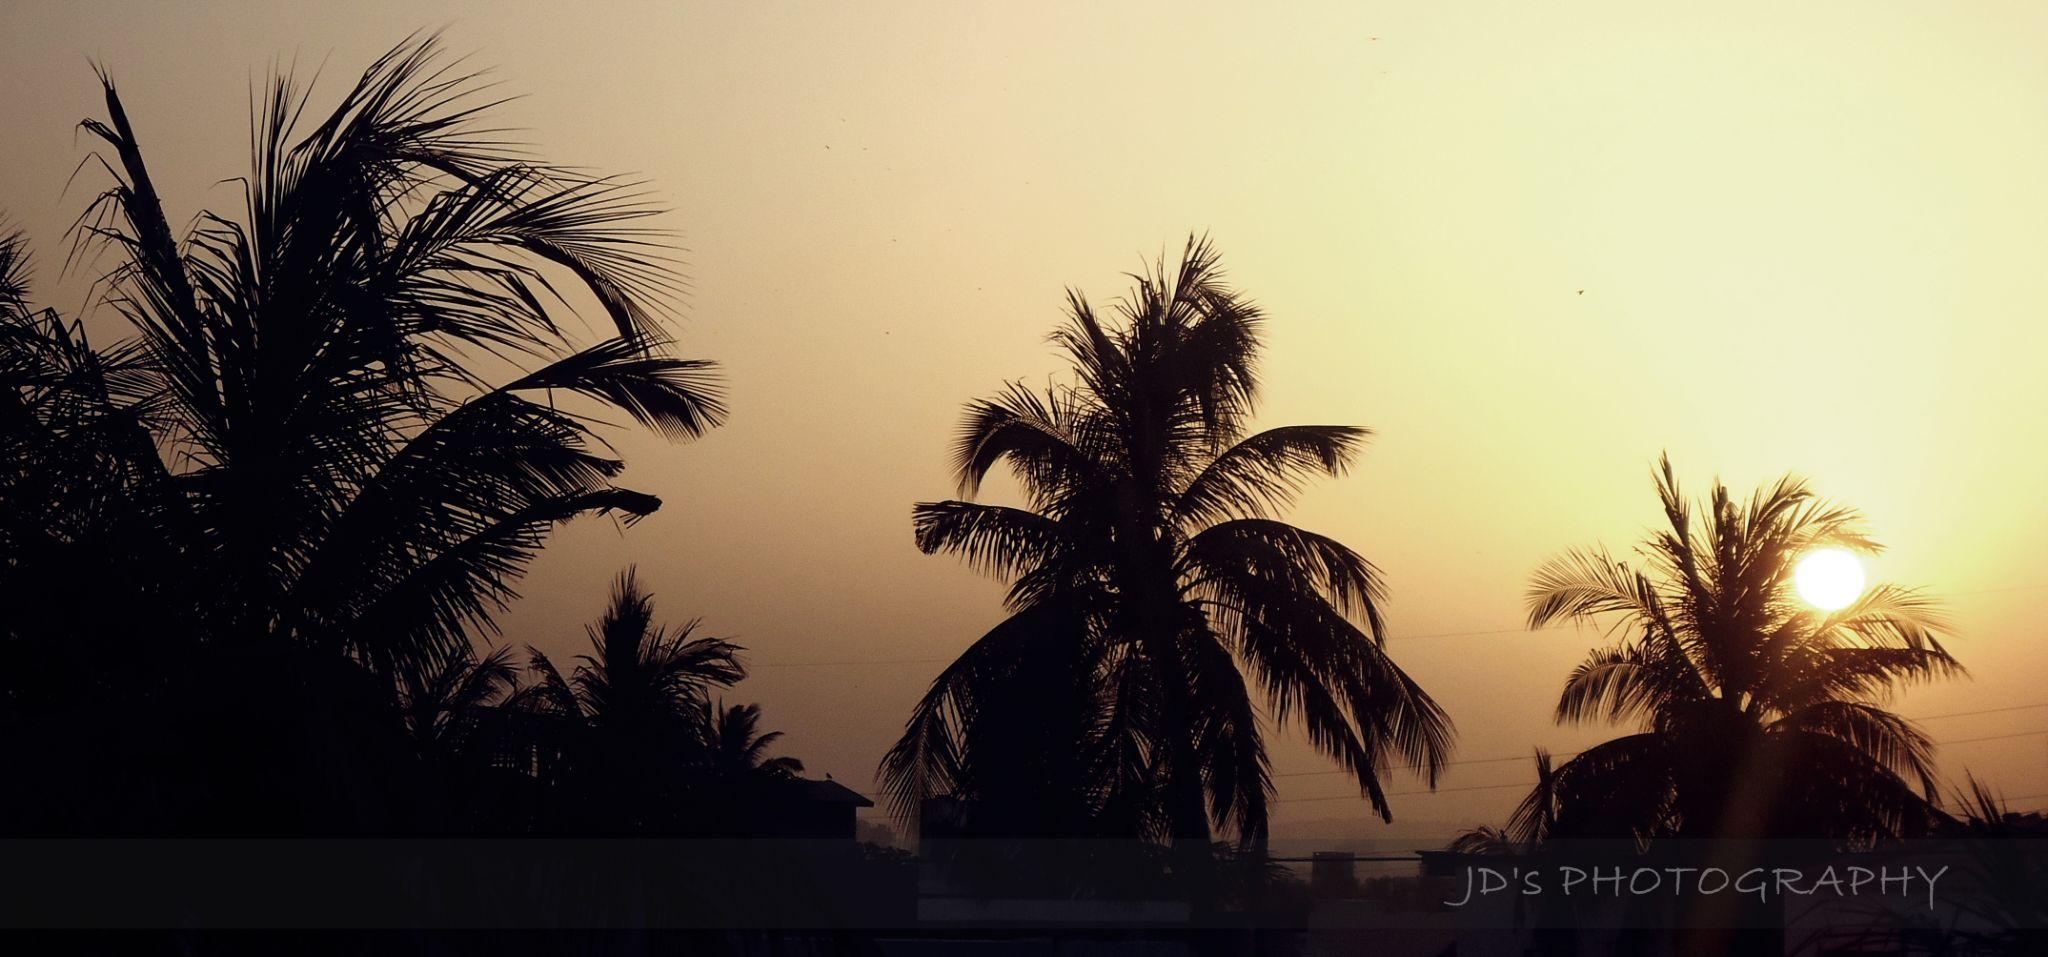 Sun-set (JD's Photography) by jawwad.khalil.16